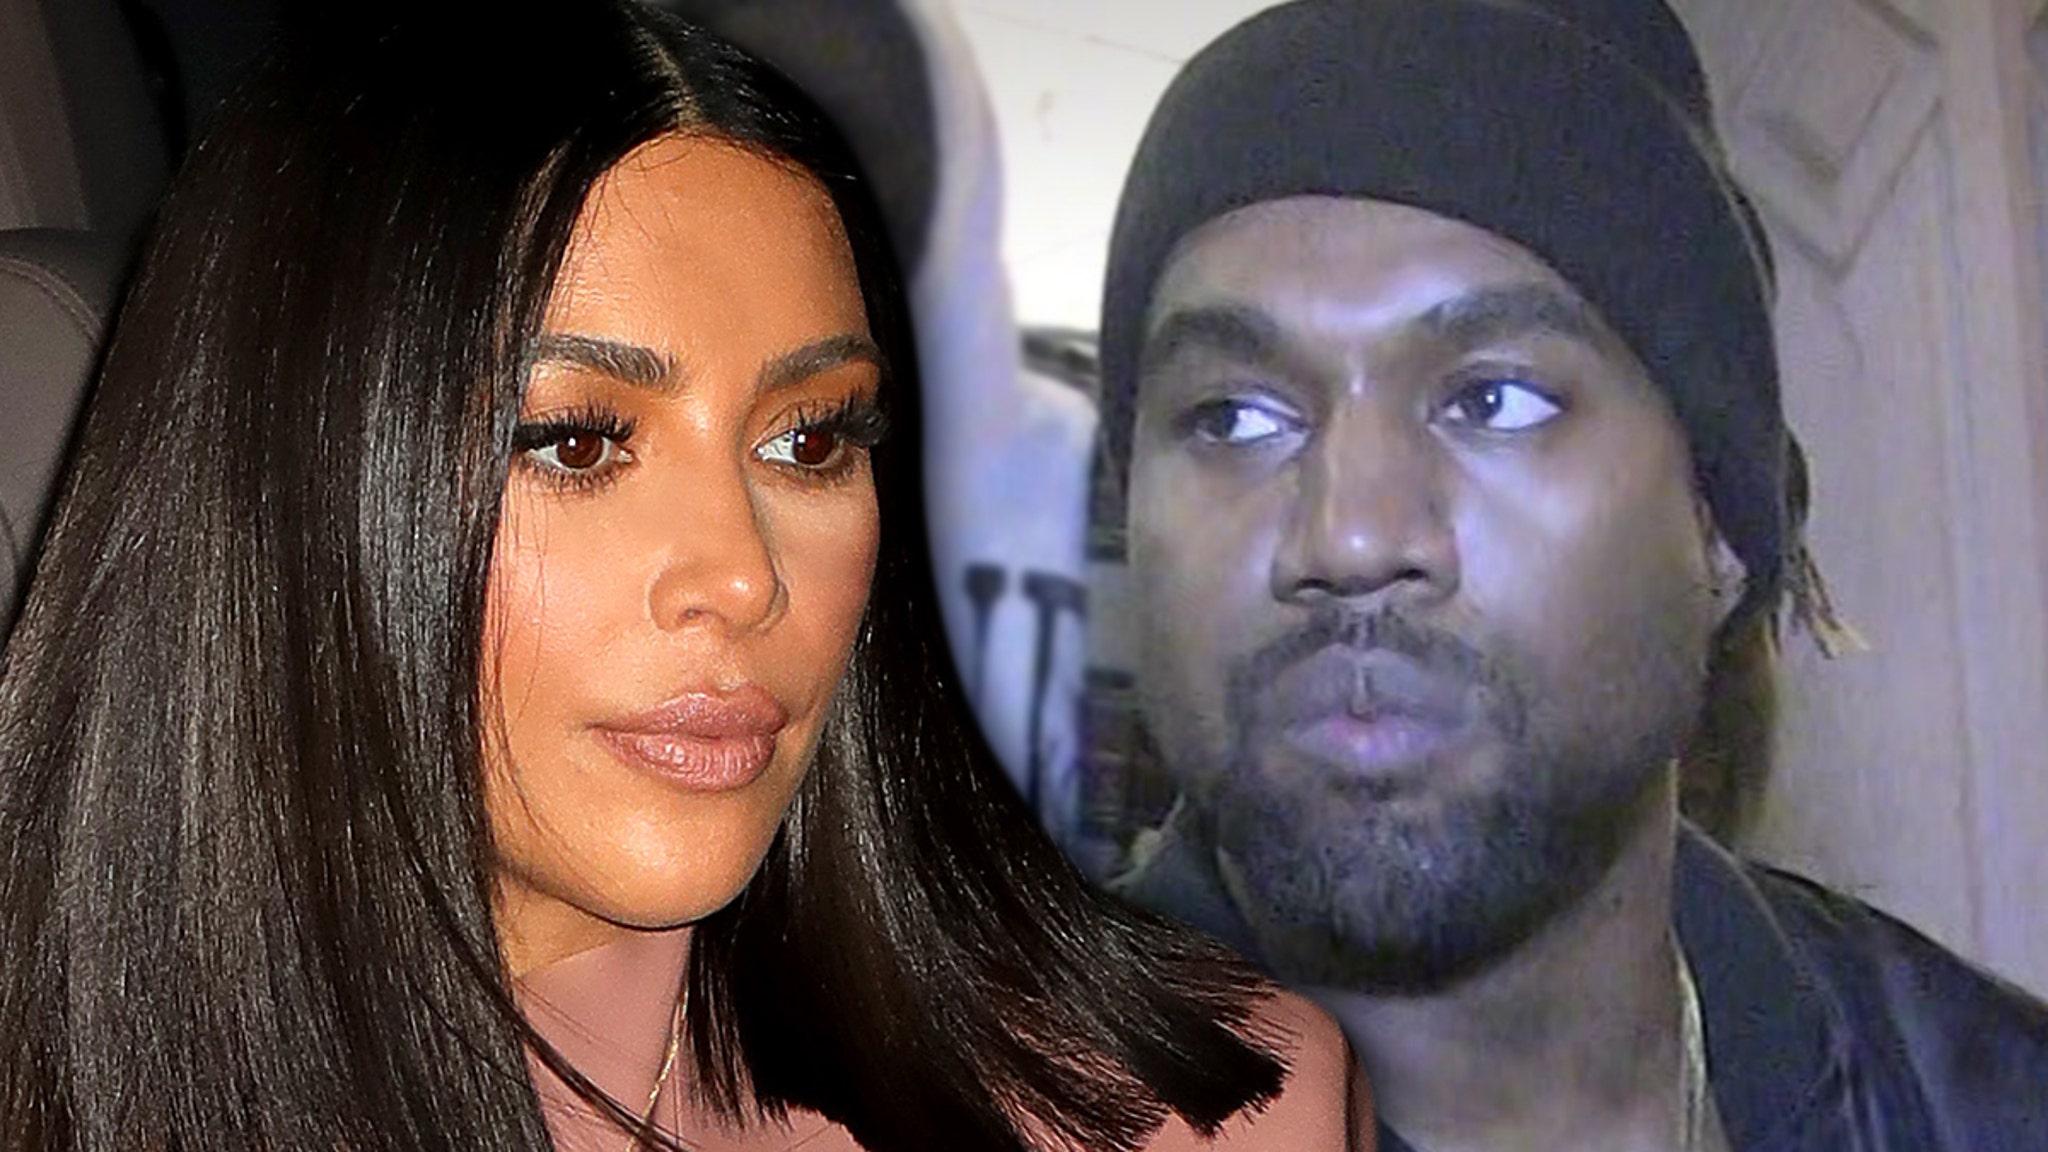 Kim Kardashian and Kanye West in Tropical Island Fortress to Avoid Paparazzi